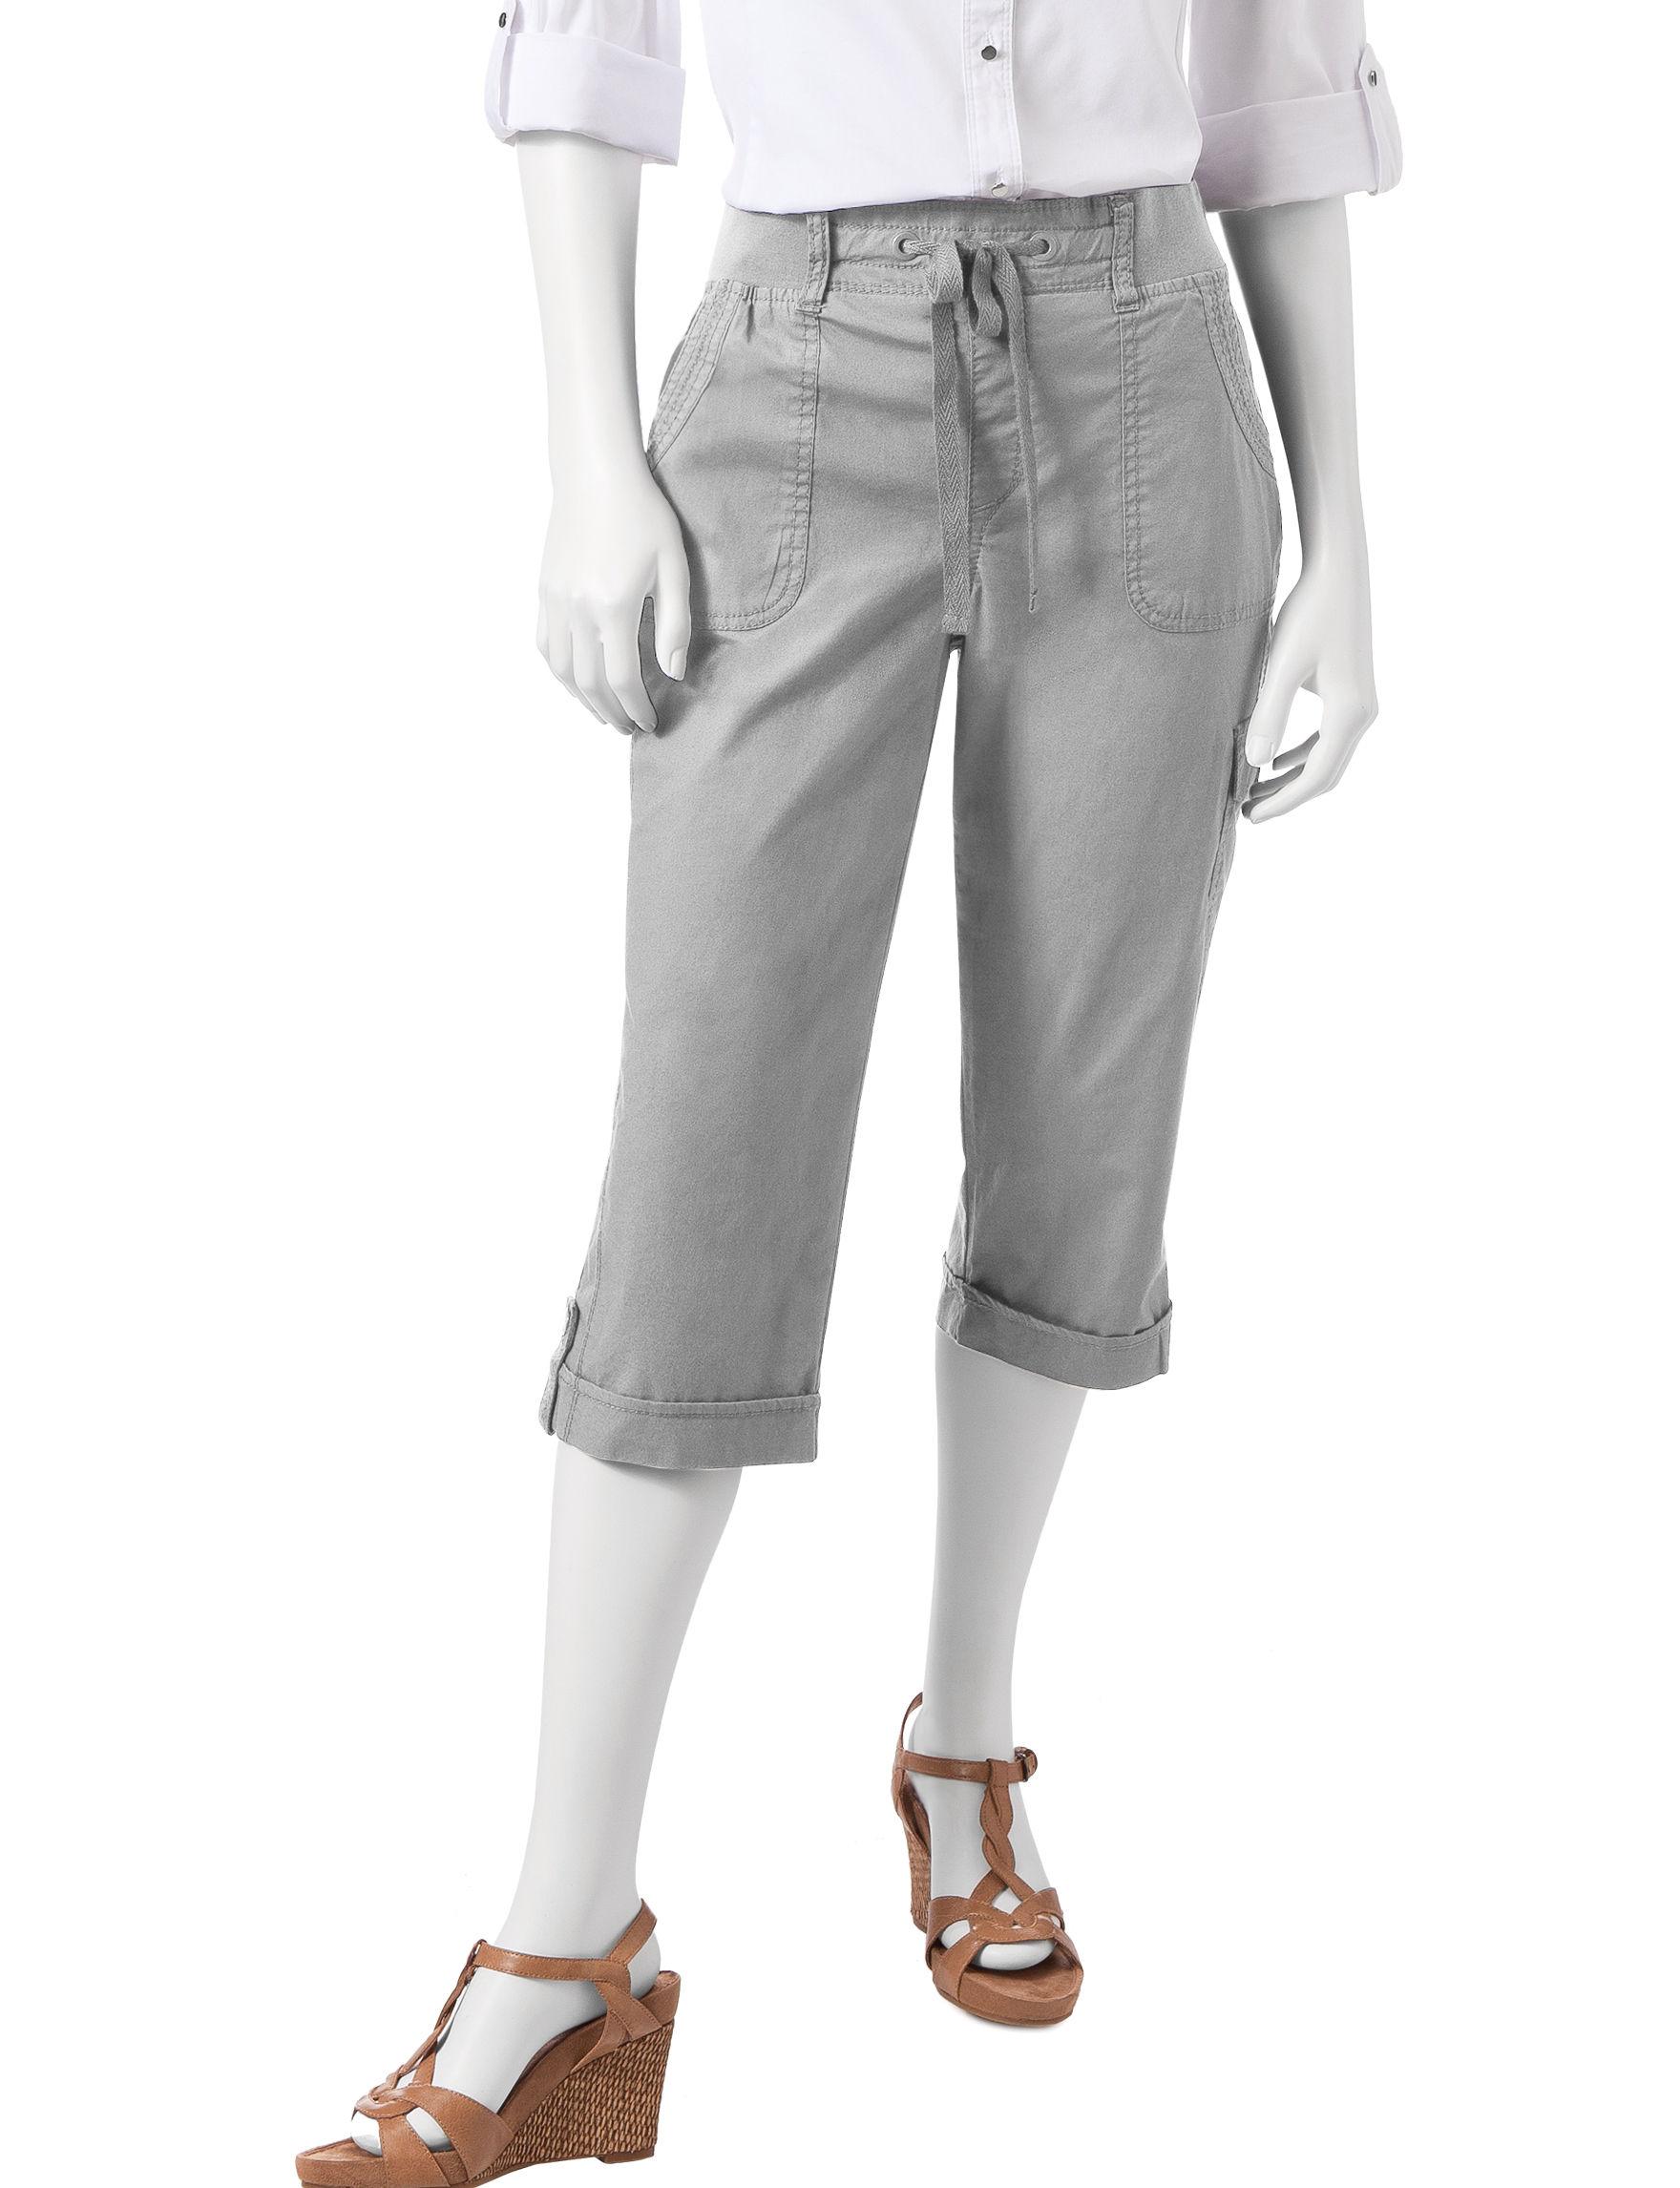 Gloria Vanderbilt Grey Capris & Crops